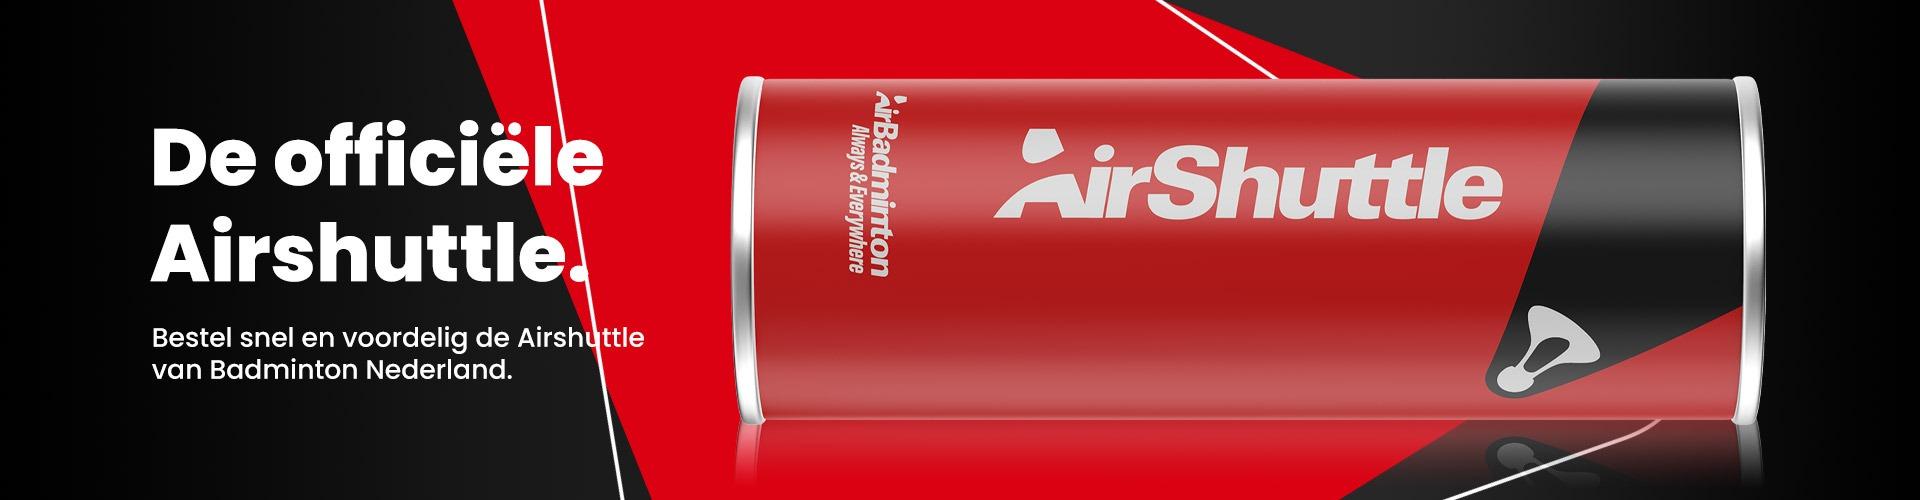 Bestel hier de officiële Airshuttle!